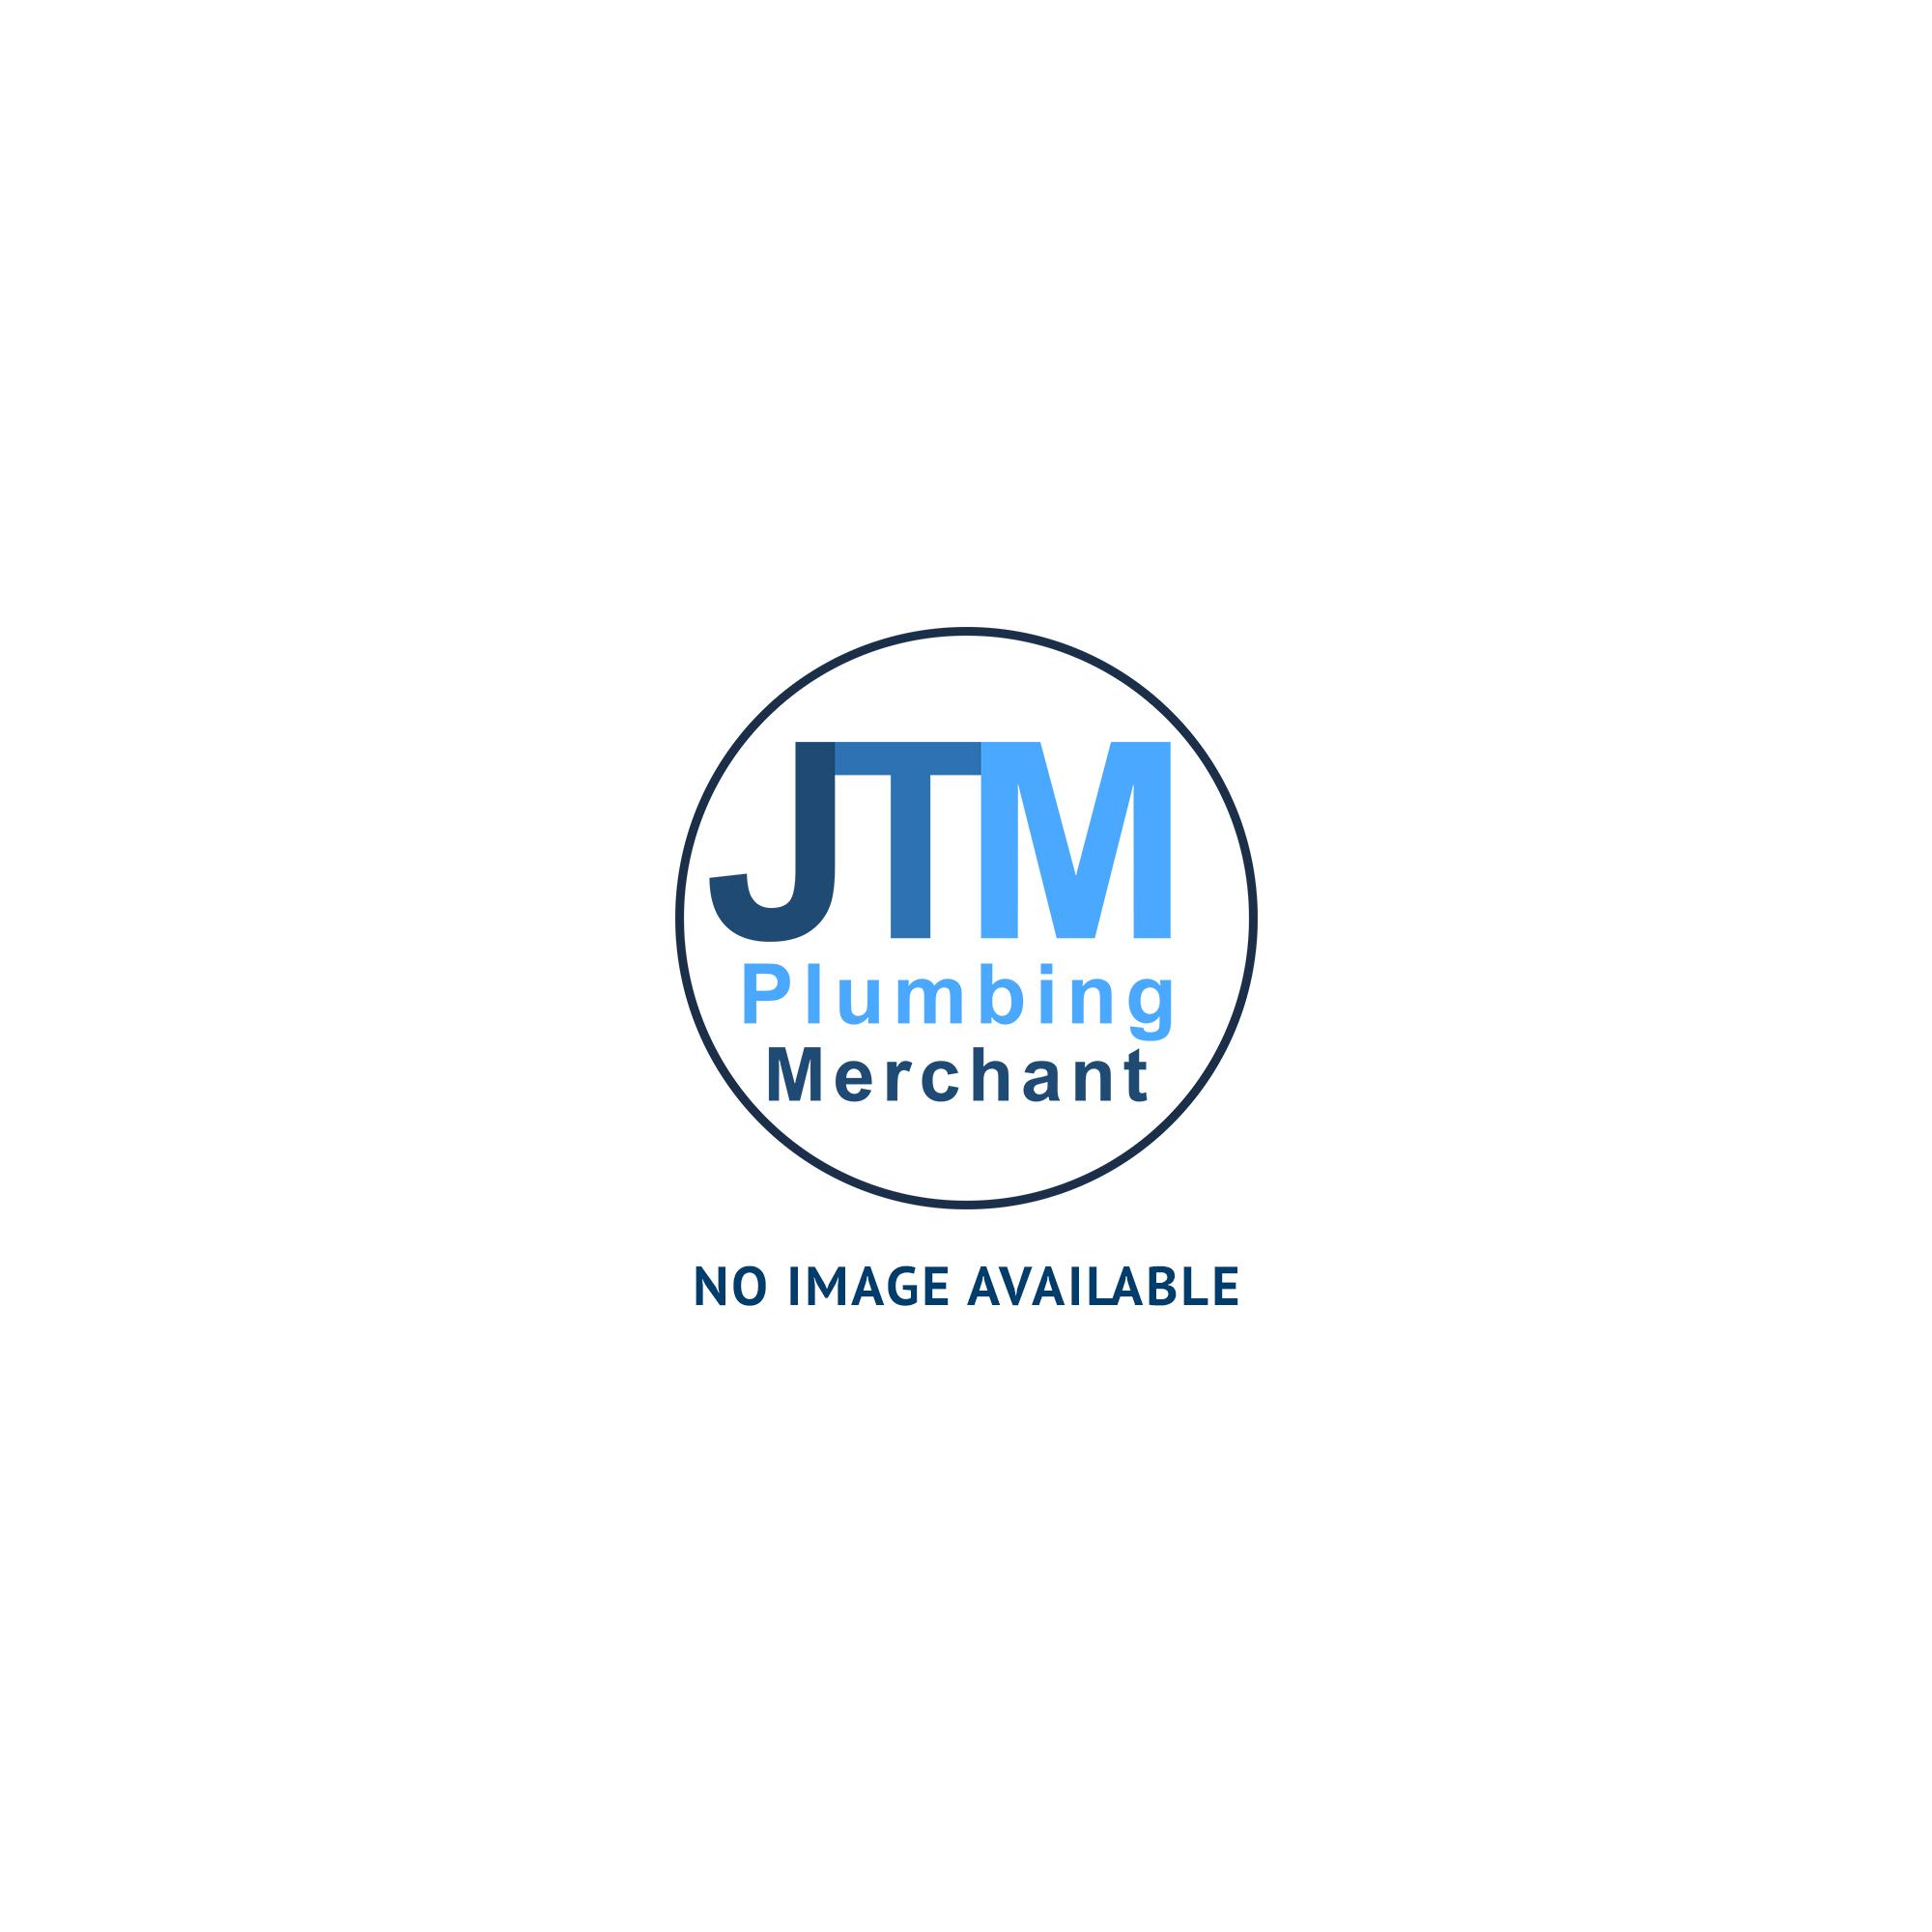 Manifold Komfort 90-3 (Stainless Steel Manifold)